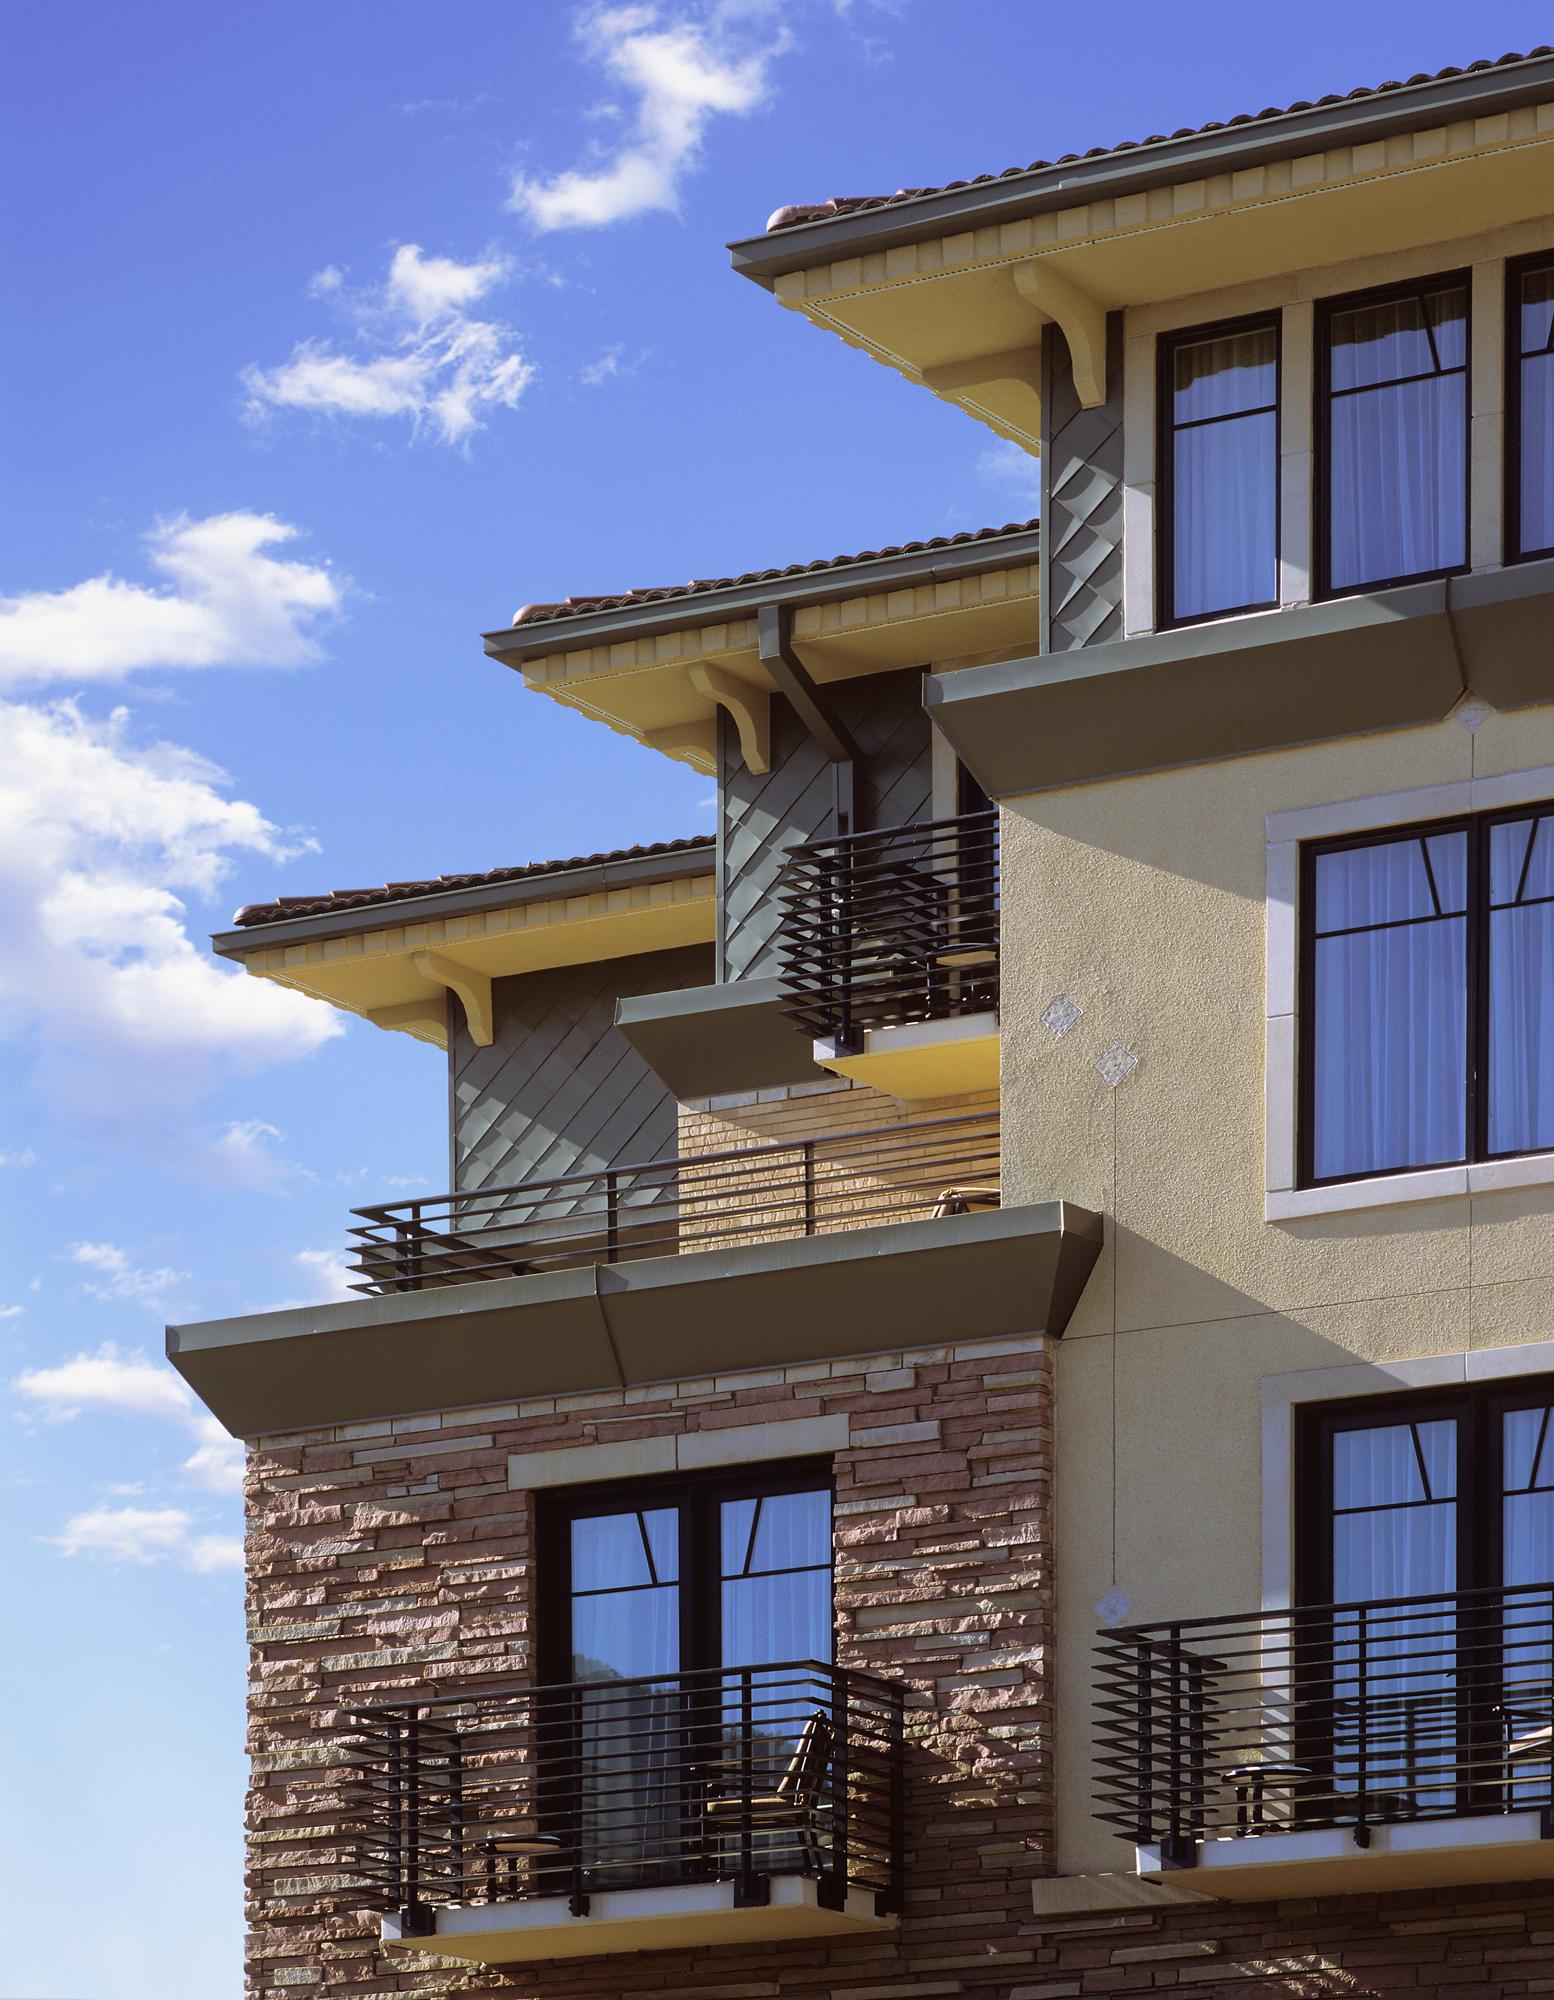 st_julien_hotel_boulder_colorado_exterior_stonework.jpg